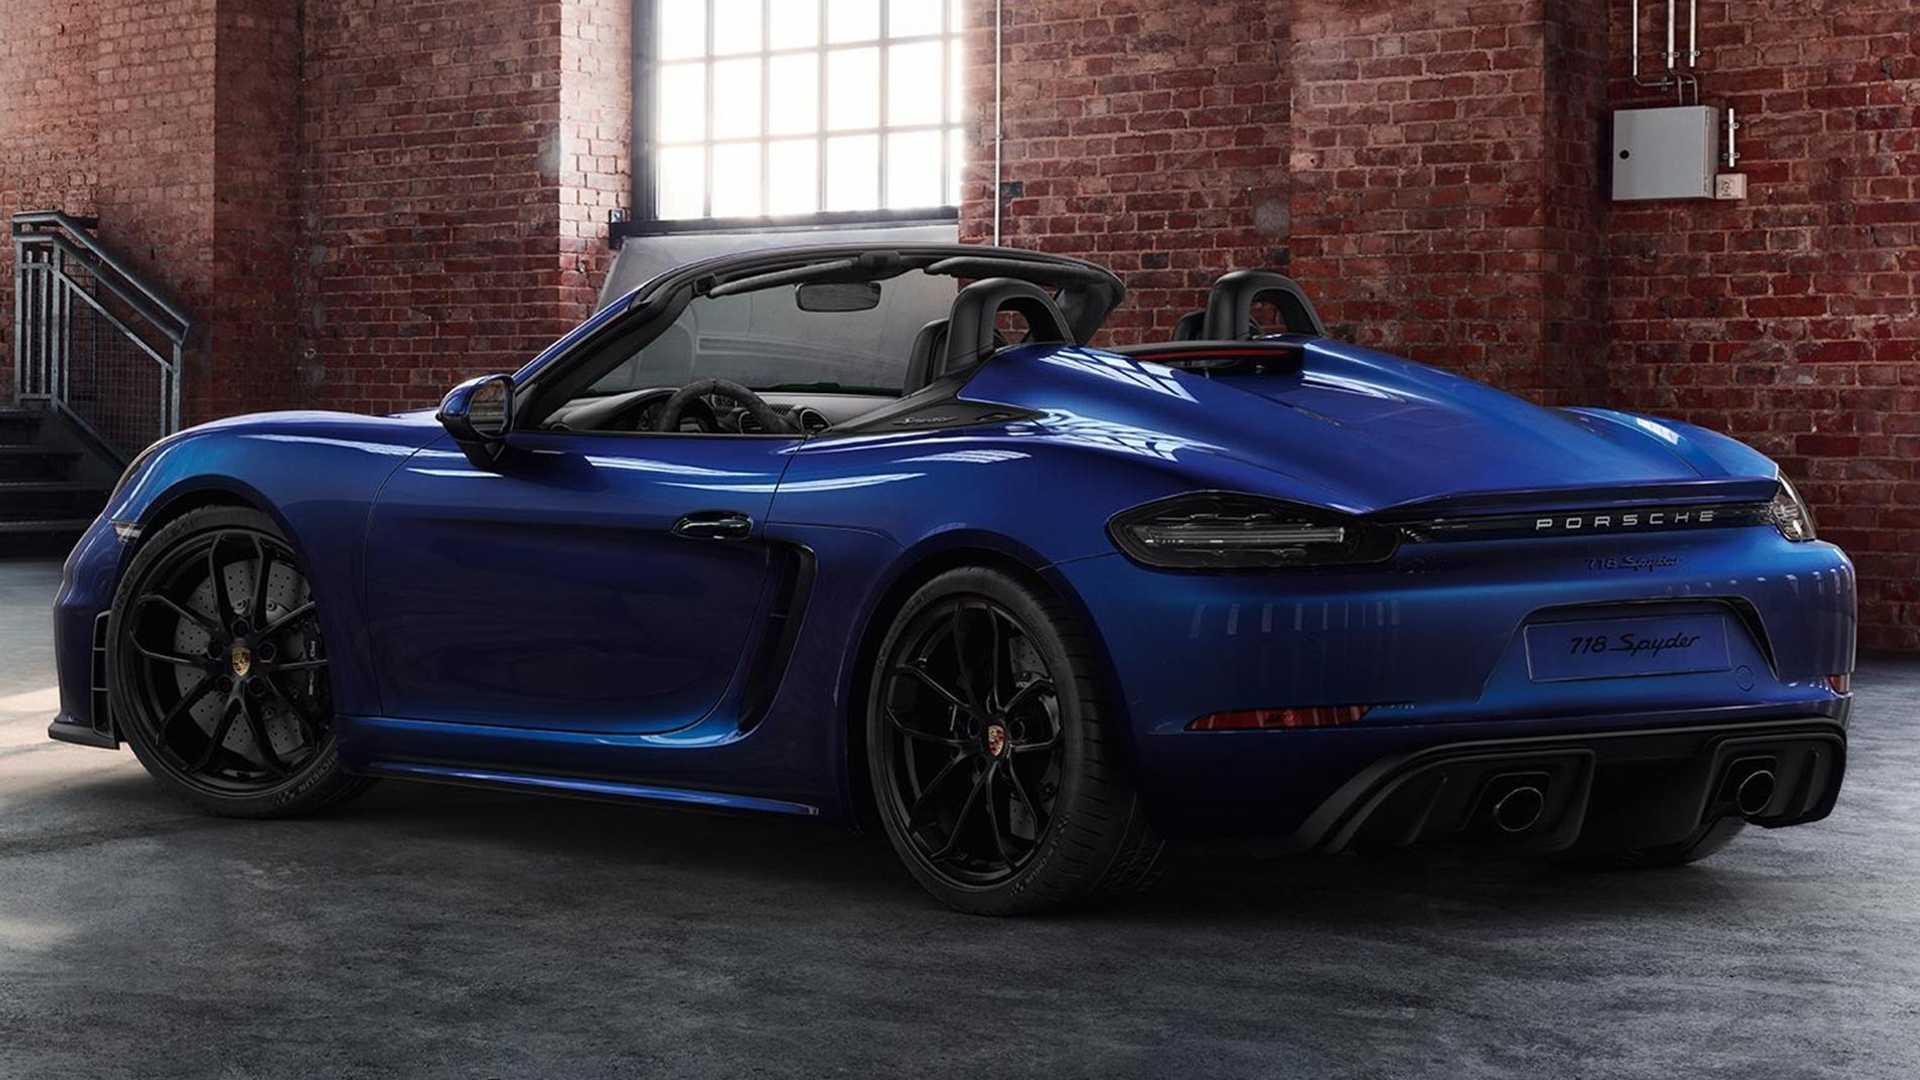 Porsche Exclusive Manufaktur Adds A Few Special Touches To